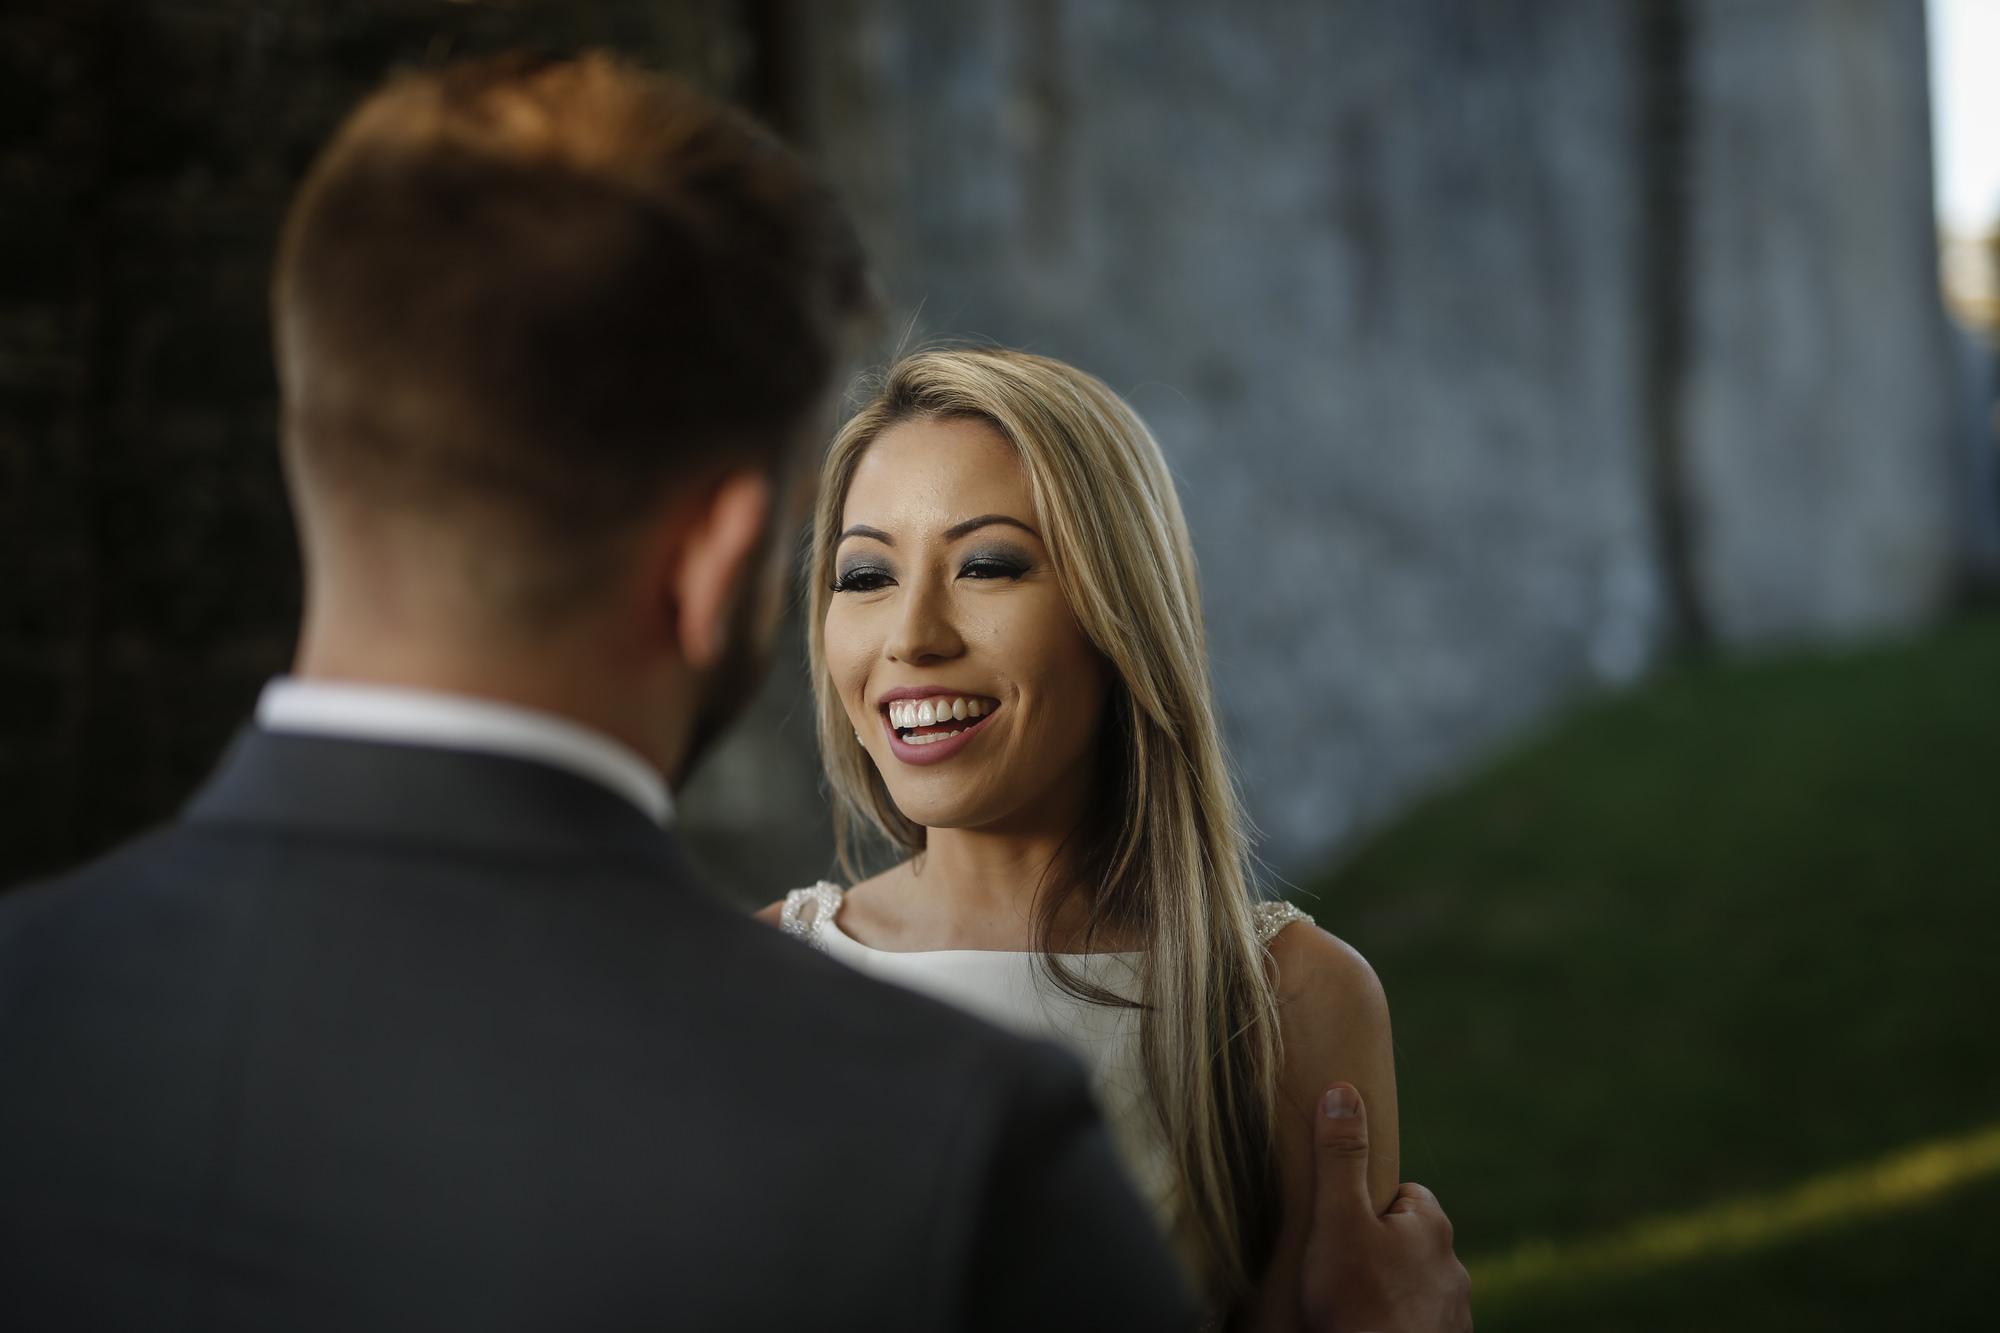 kilkea_castle_wedding_photographer_goldenmoments_061.jpg